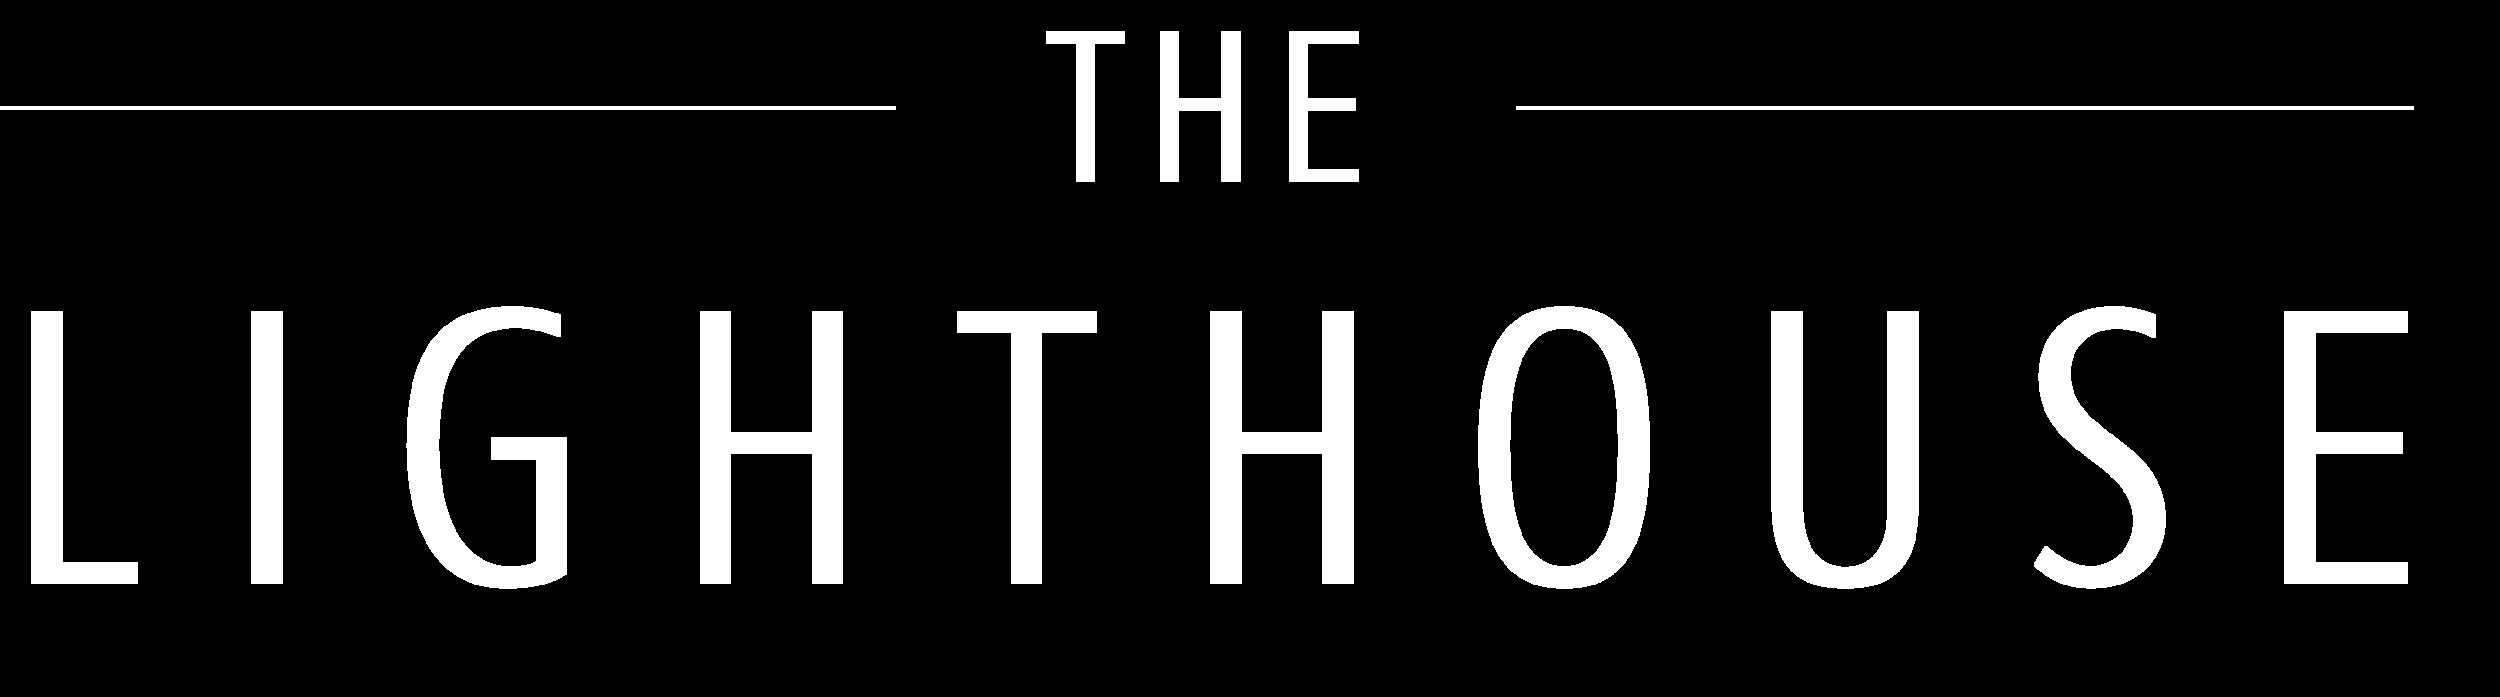 The Lighthouse Dispensary Coachella — Cannabis Boutique